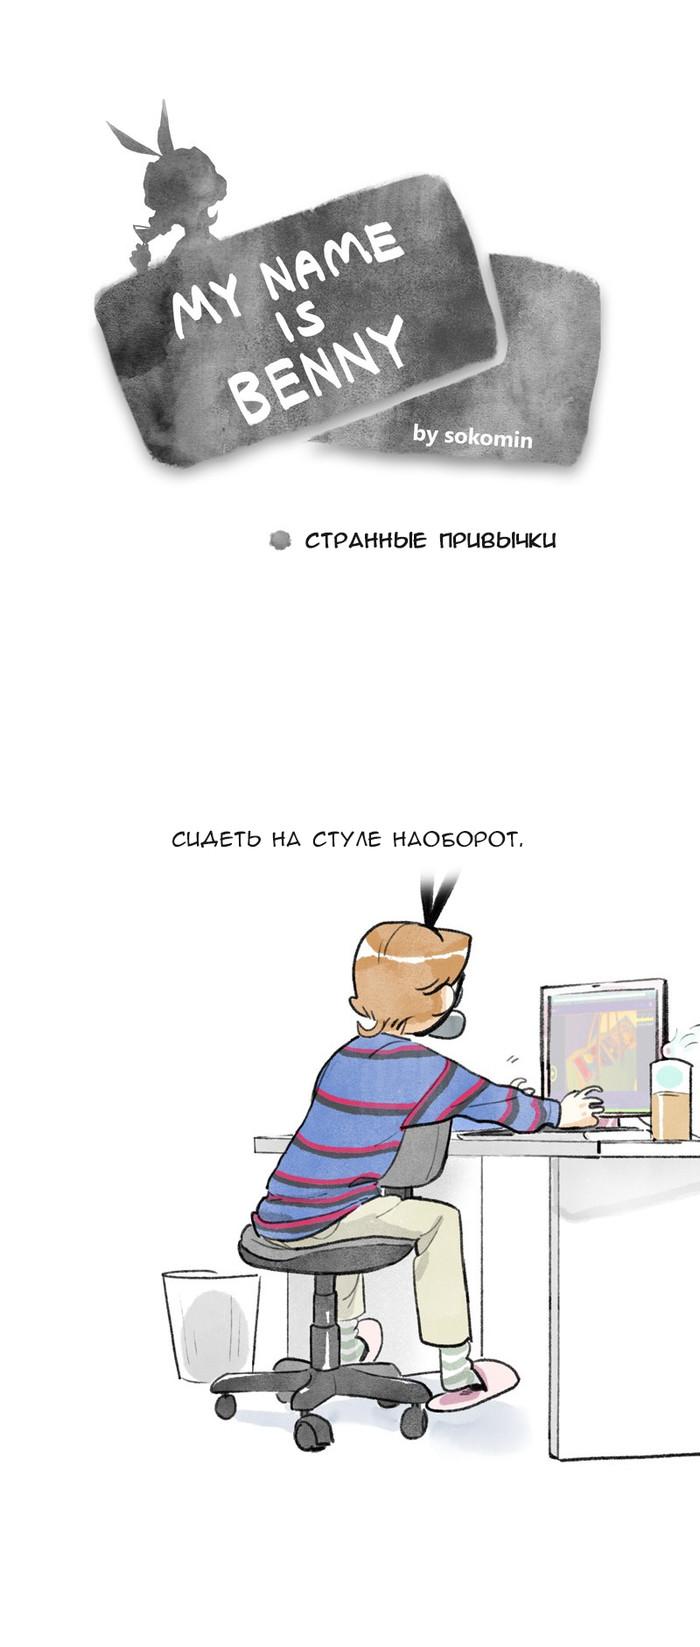 My name is Benny (Ep.76) Sokomin, Mnib, Перевел сам, Комиксы, Длиннопост